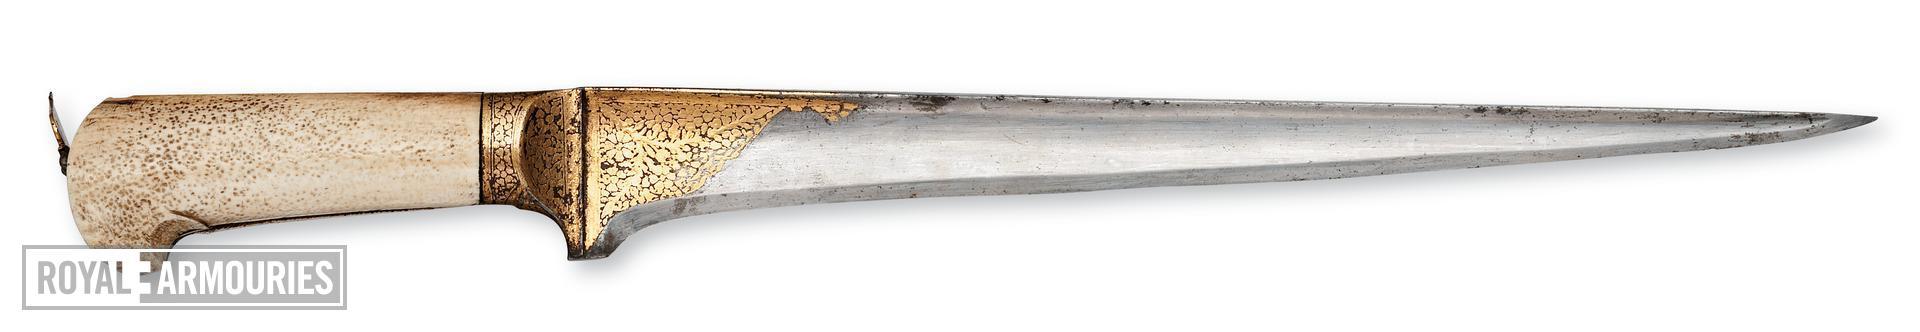 Dagger (peshkabz) With koftgari on hilt